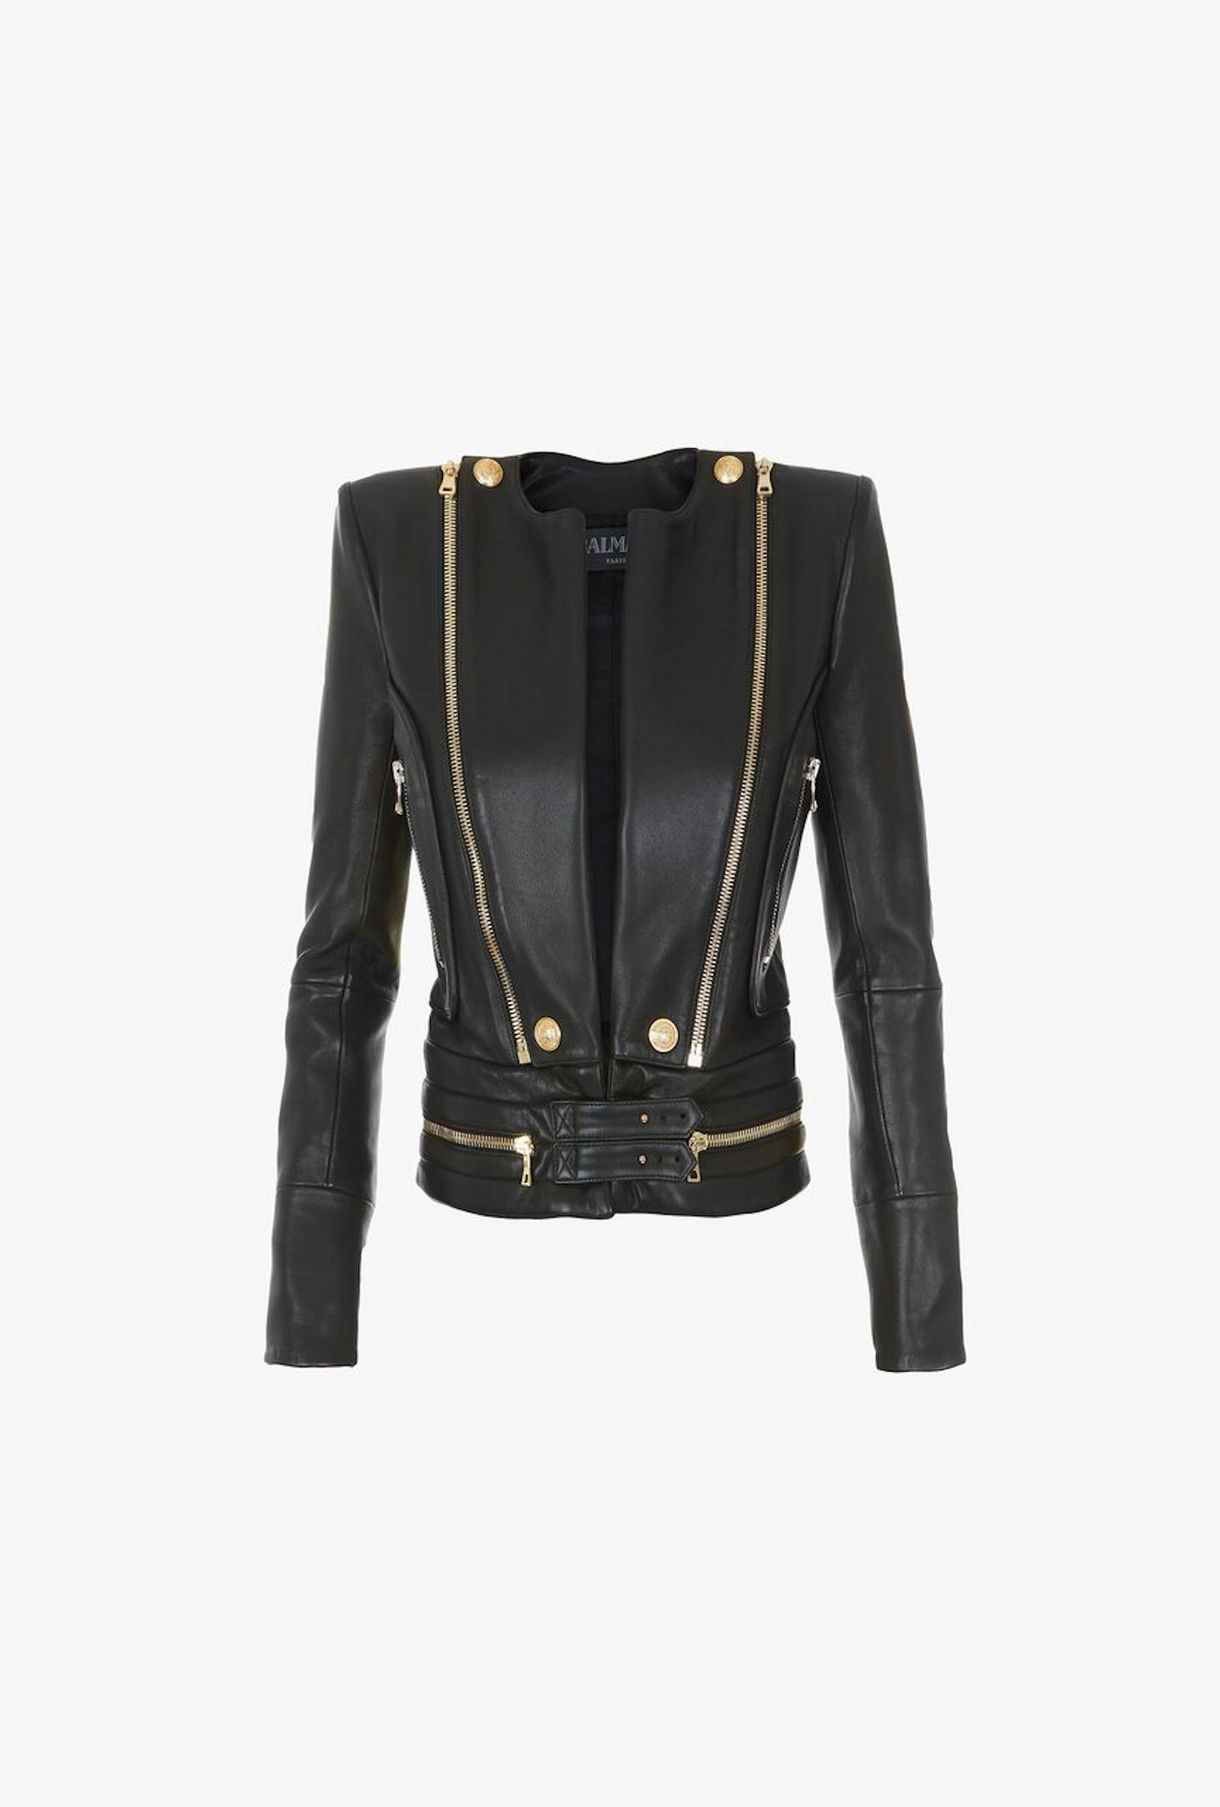 Leather Jacket With Gold Tone Zipper Accents For Women Balmain Com Denim Mini Dress Coats For Women Black Leather Pants [ 1807 x 1220 Pixel ]